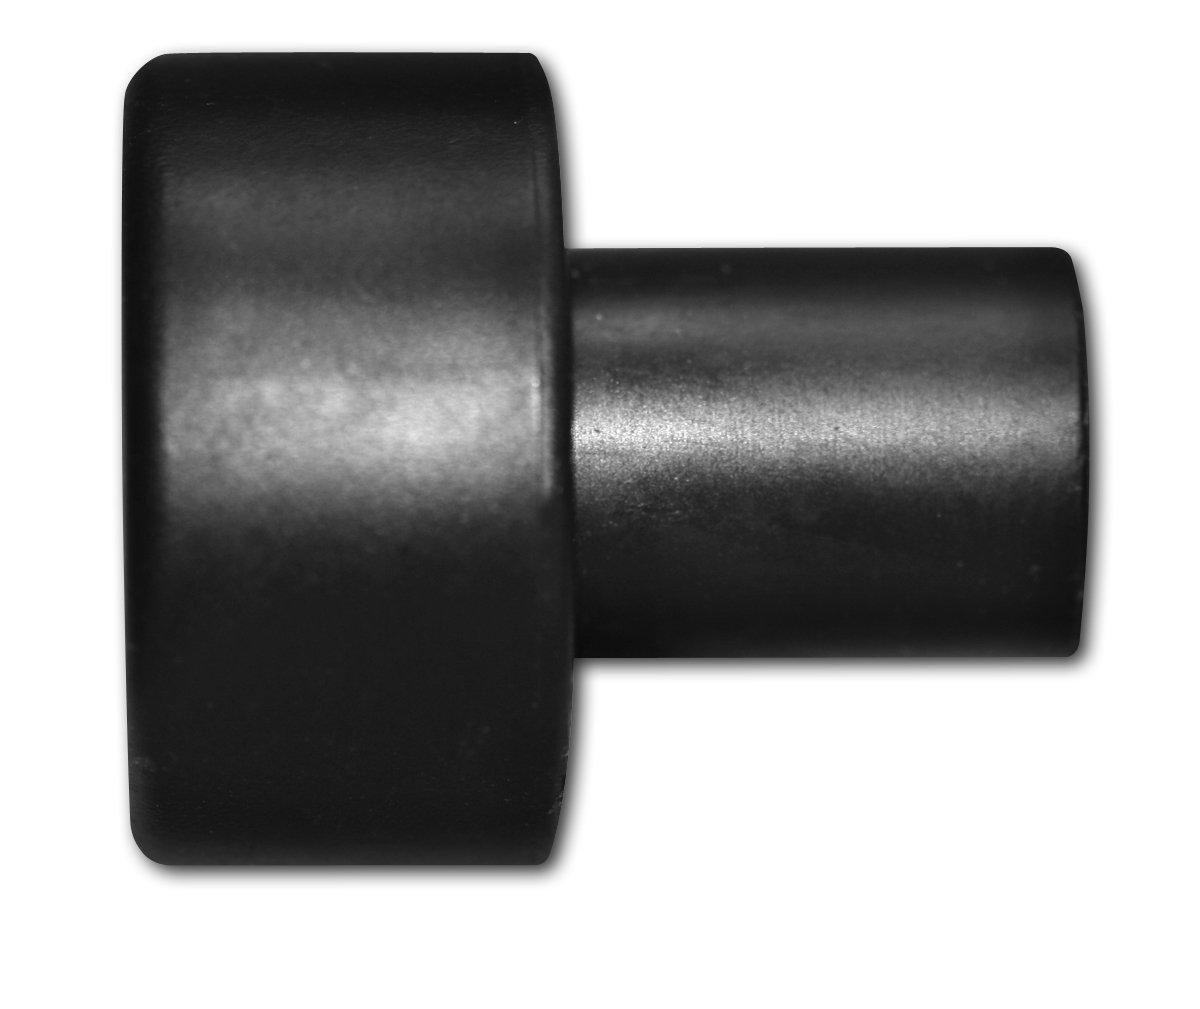 10 Per Box Powers Fastening Innovations 08303 1-1//8-Inch Adhesive Piston 1-Inch Rod #8 Rebar